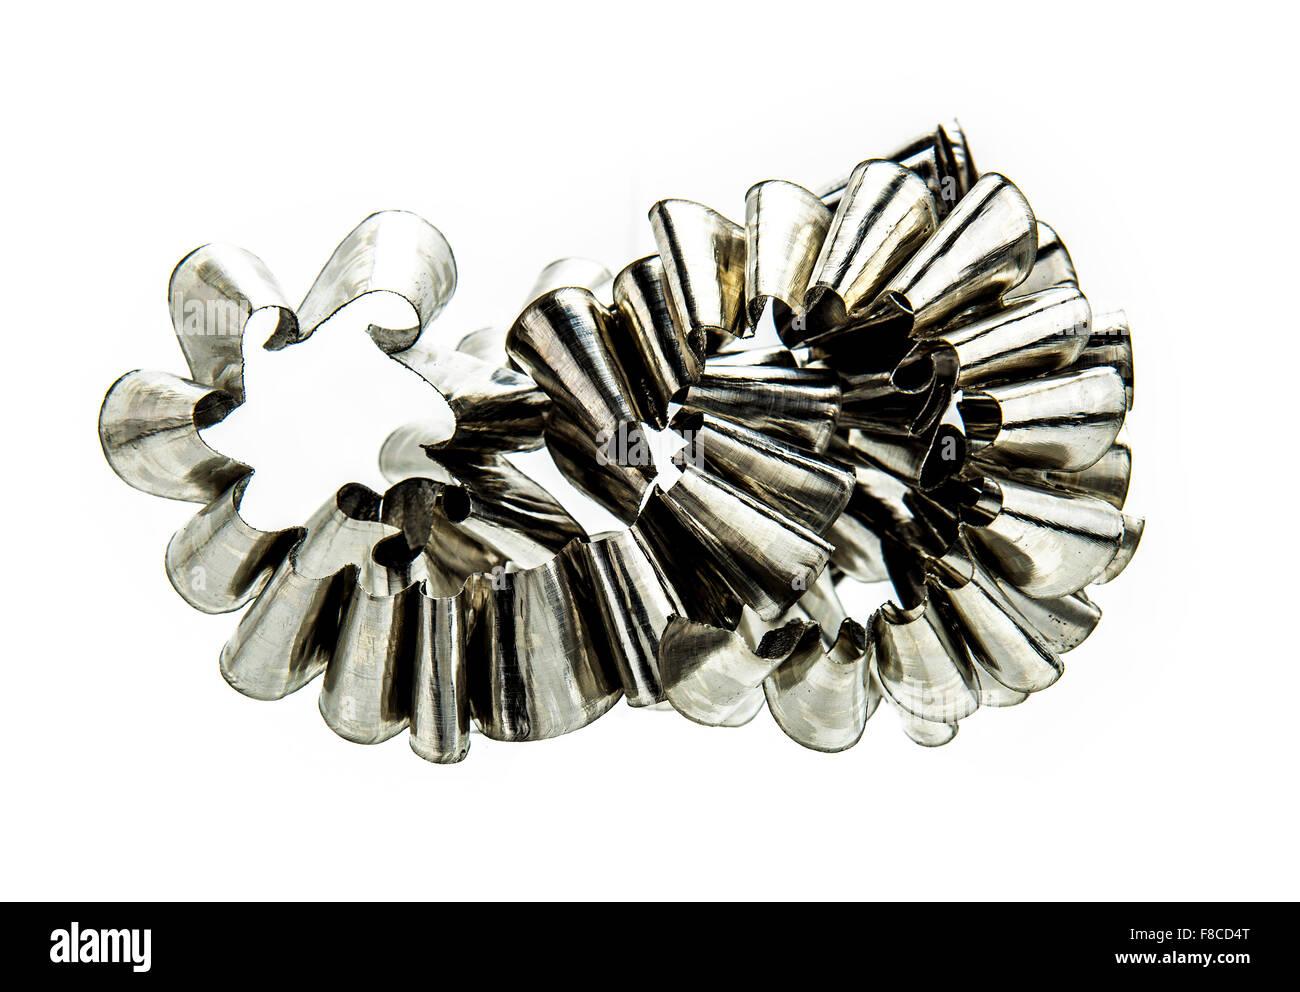 Metal Swarf on white  background - Stock Image